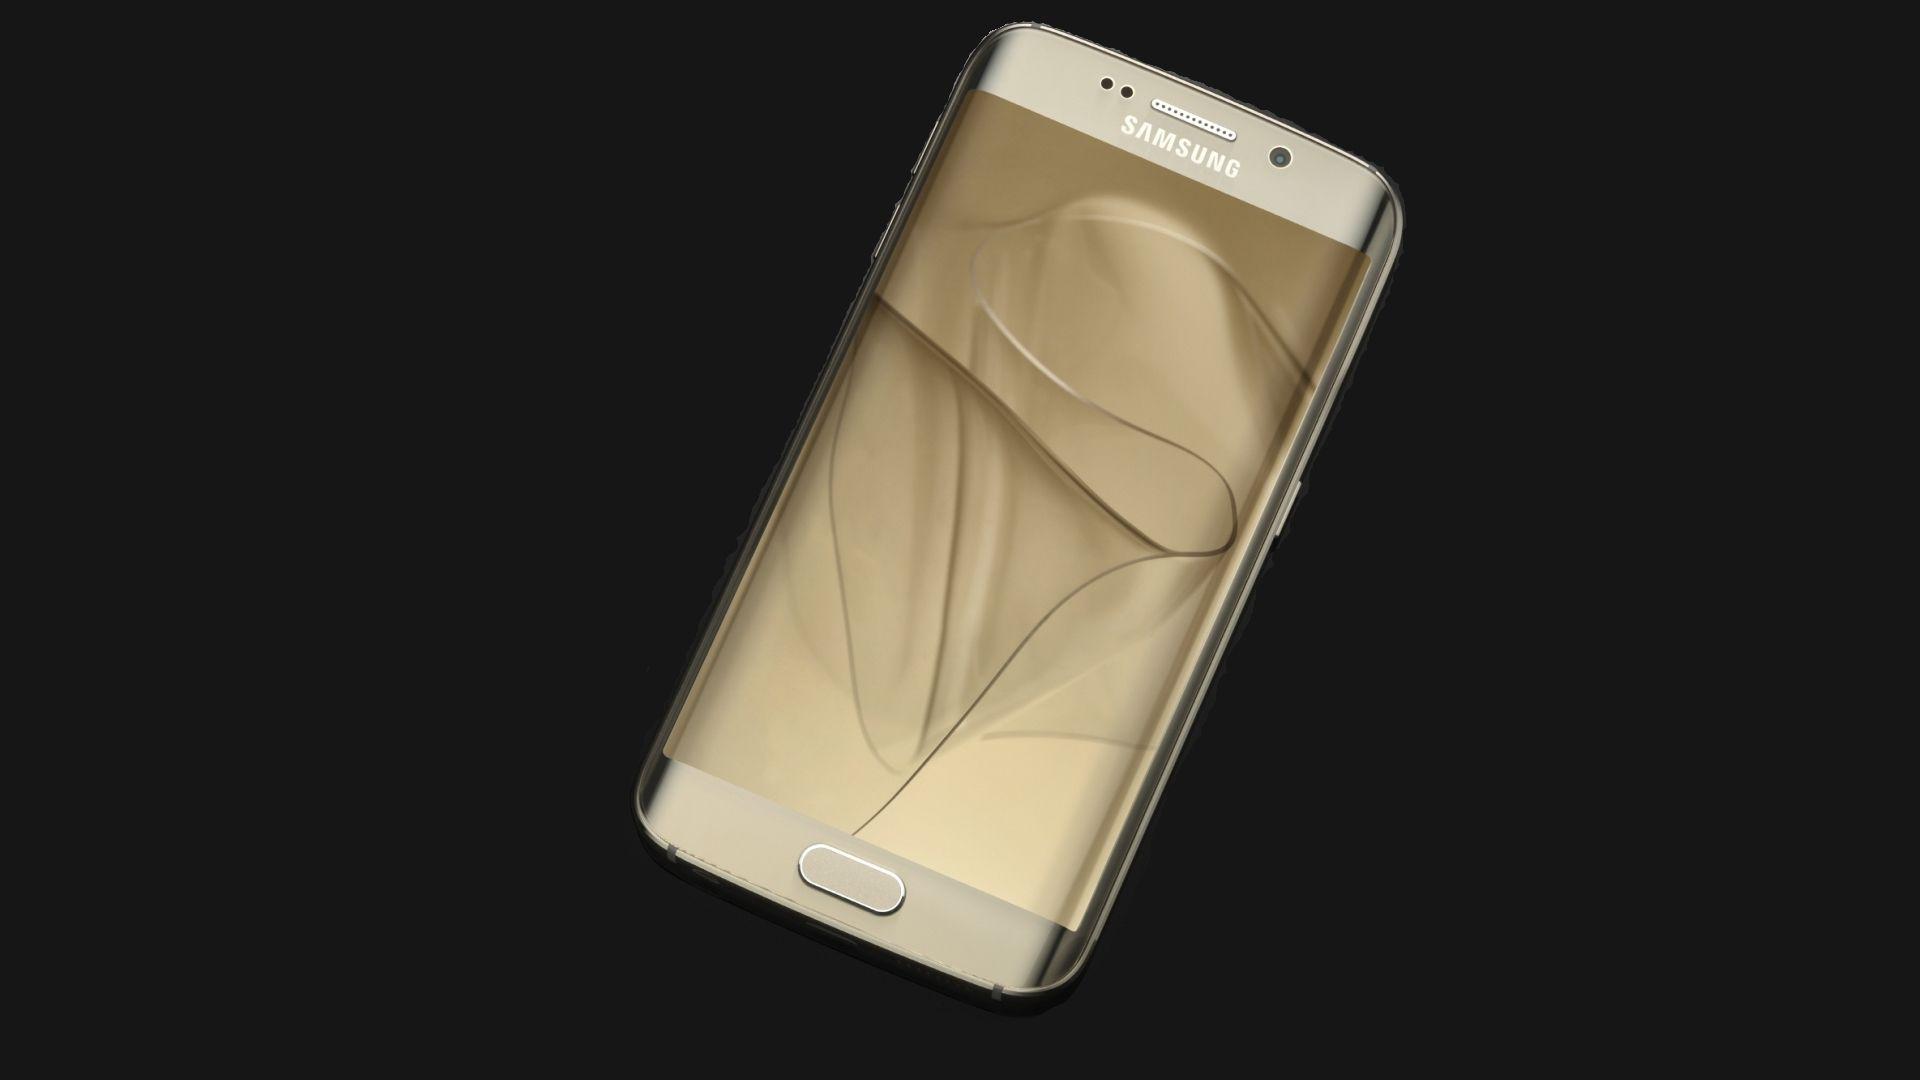 Samsung Galaxy S6 Edge Gold Platinum Hd Wallpapers 1080p Samsung Galaxy Samsung Samsung Galaxy S6 Edge